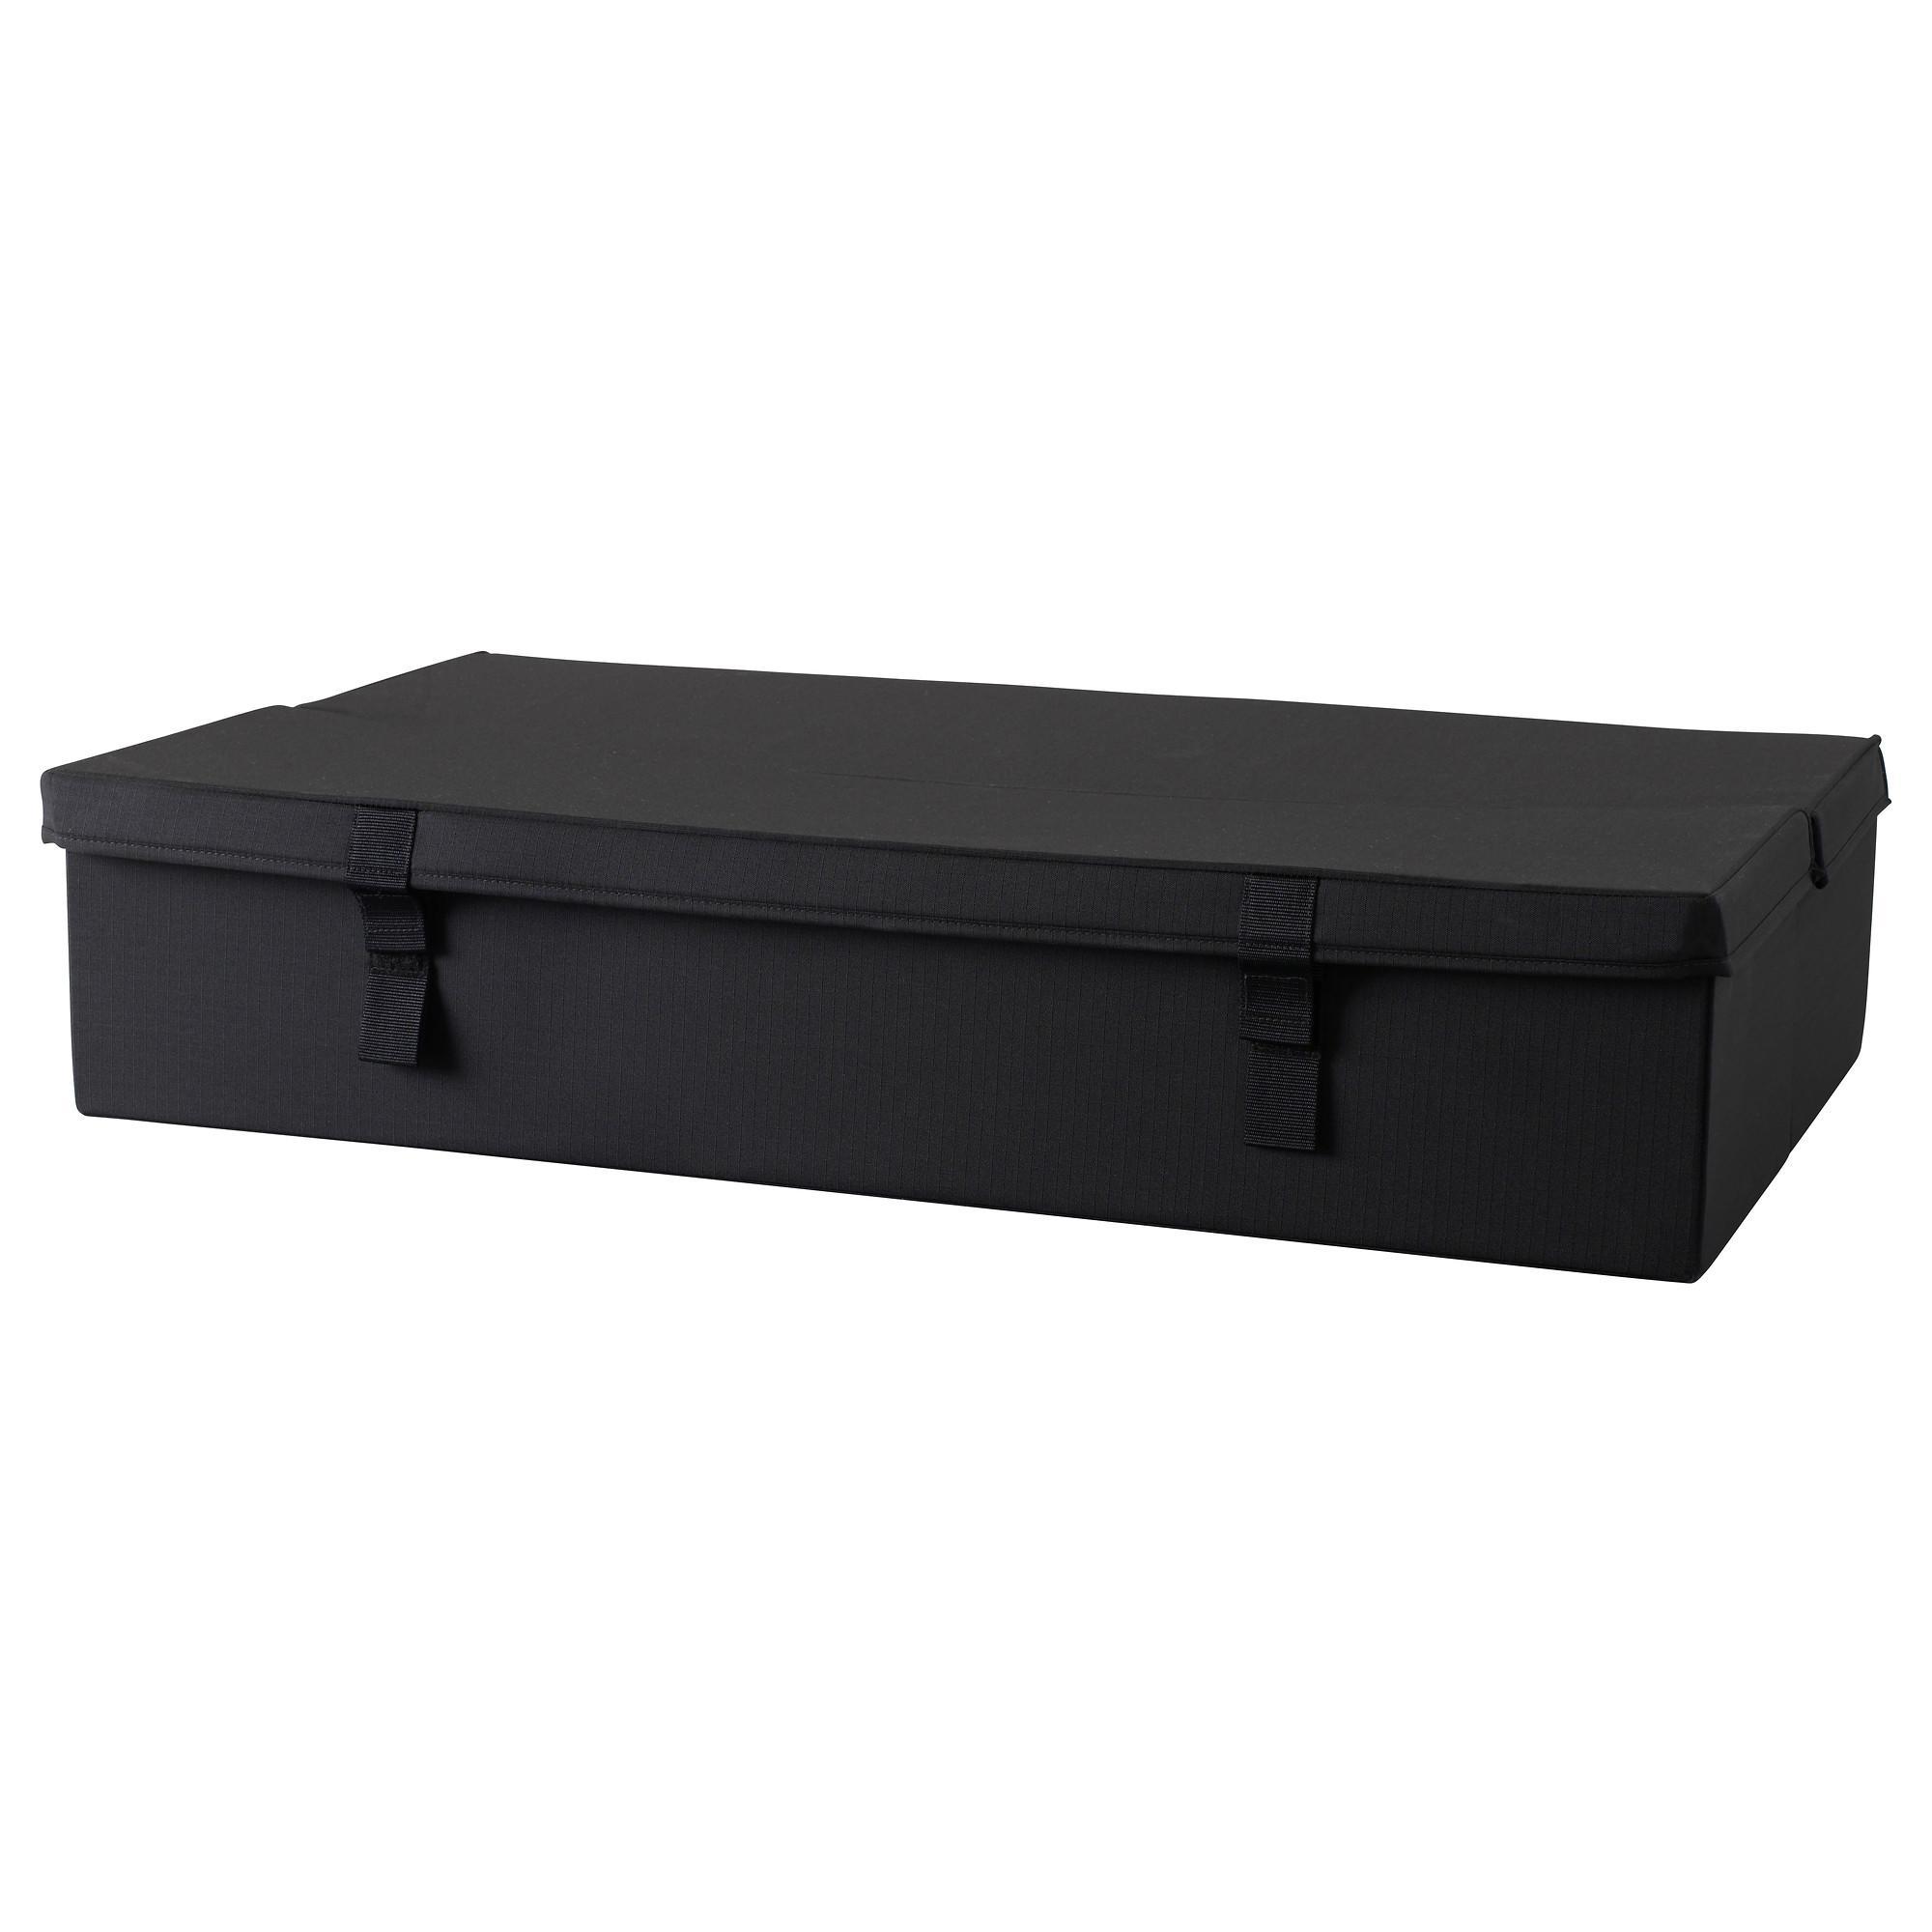 Lycksele Storage Box 2 Seat Sofa Bed Black – Ikea Inside Storage Sofa Ikea (Image 19 of 20)